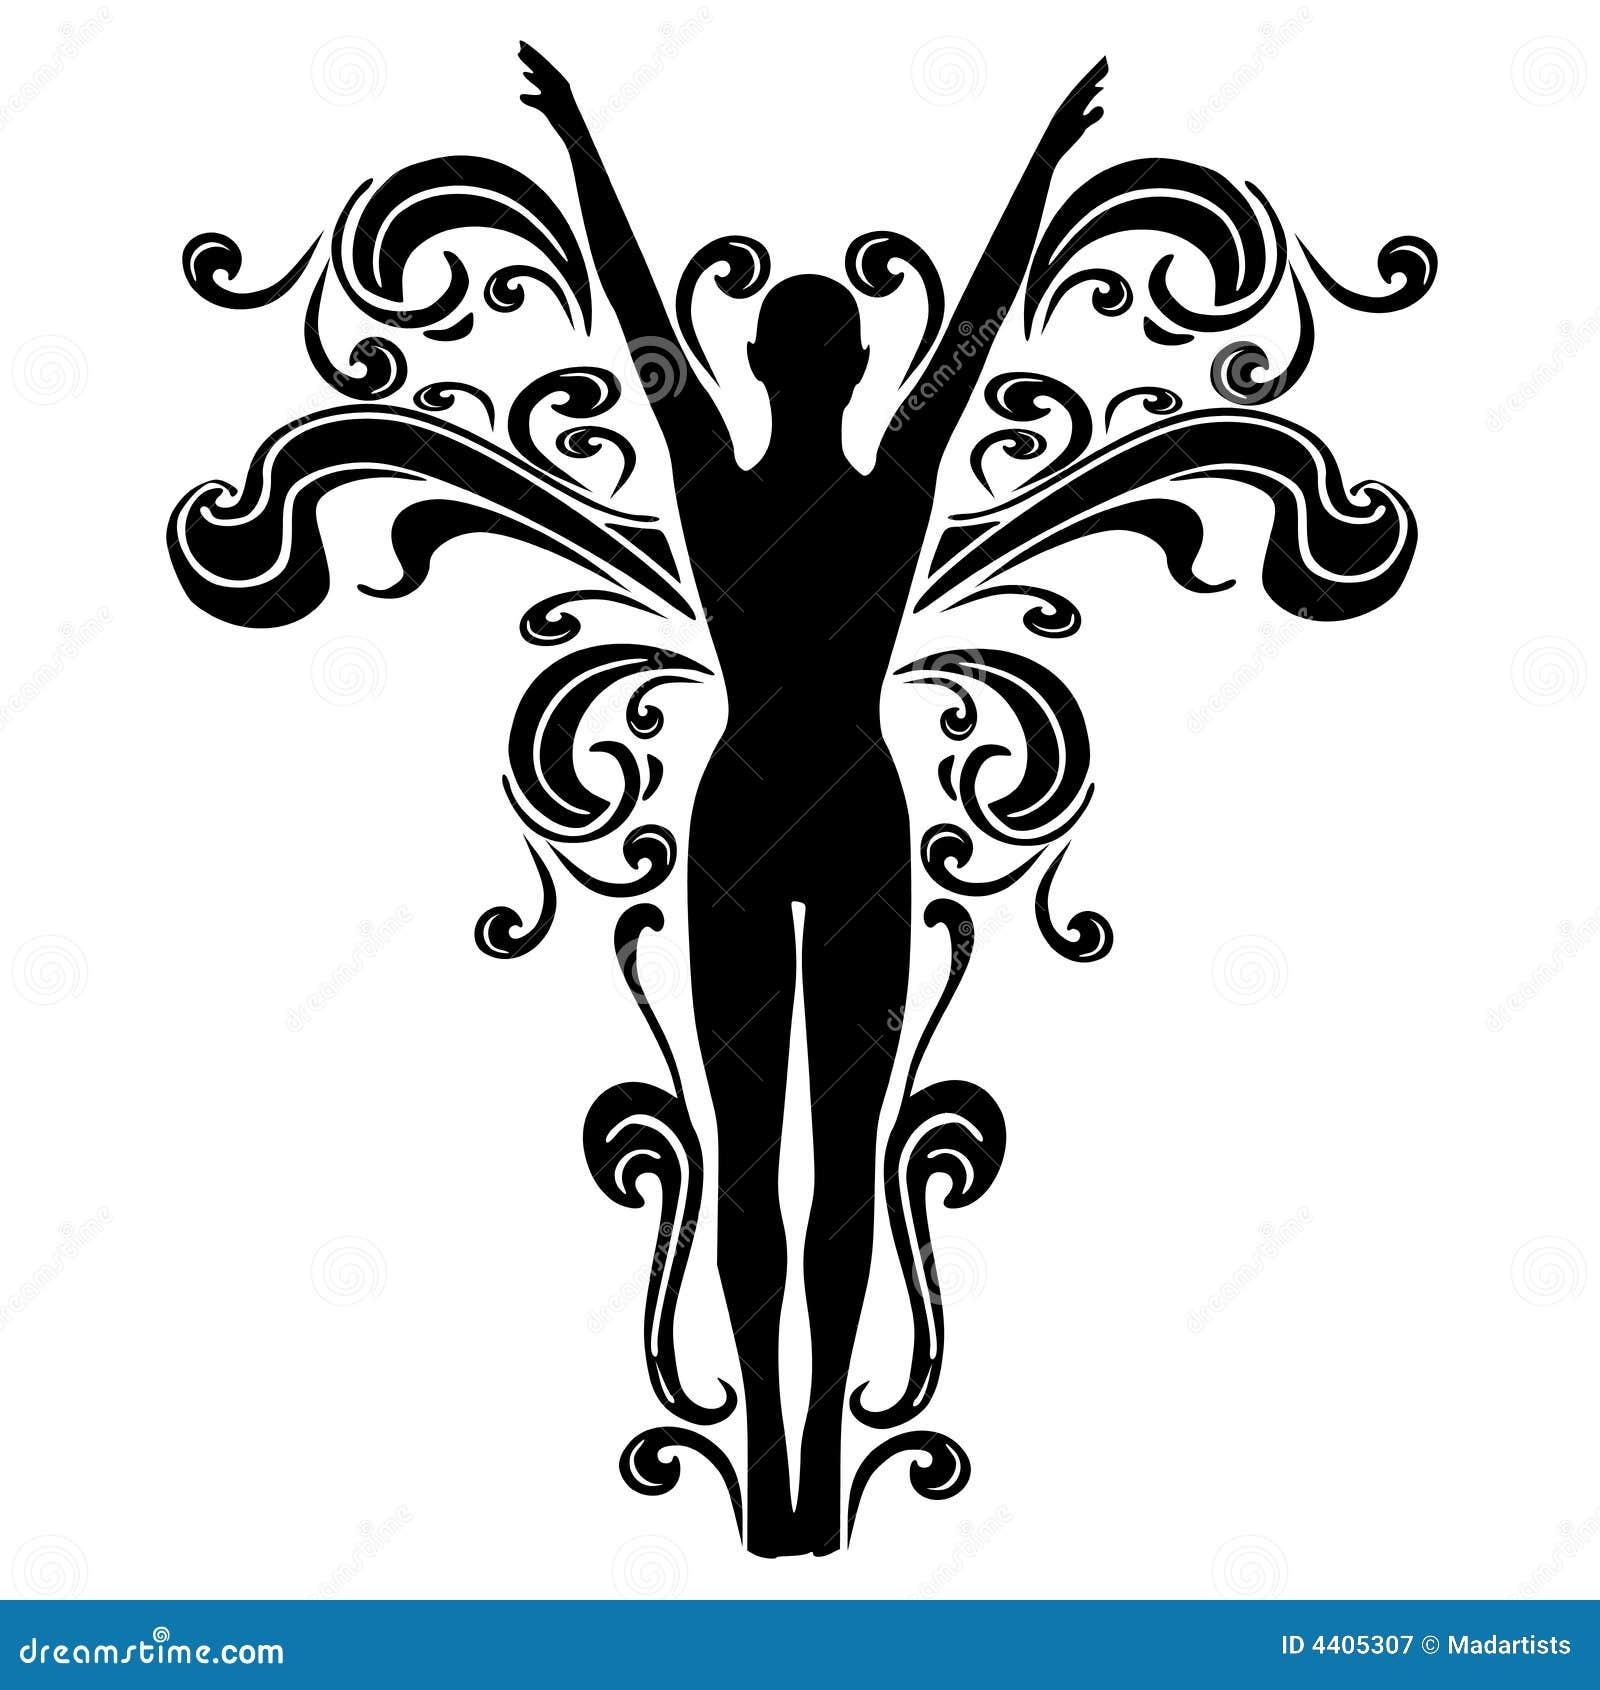 flourishes female tattoo design 2 royalty free stock photography image 4405307. Black Bedroom Furniture Sets. Home Design Ideas